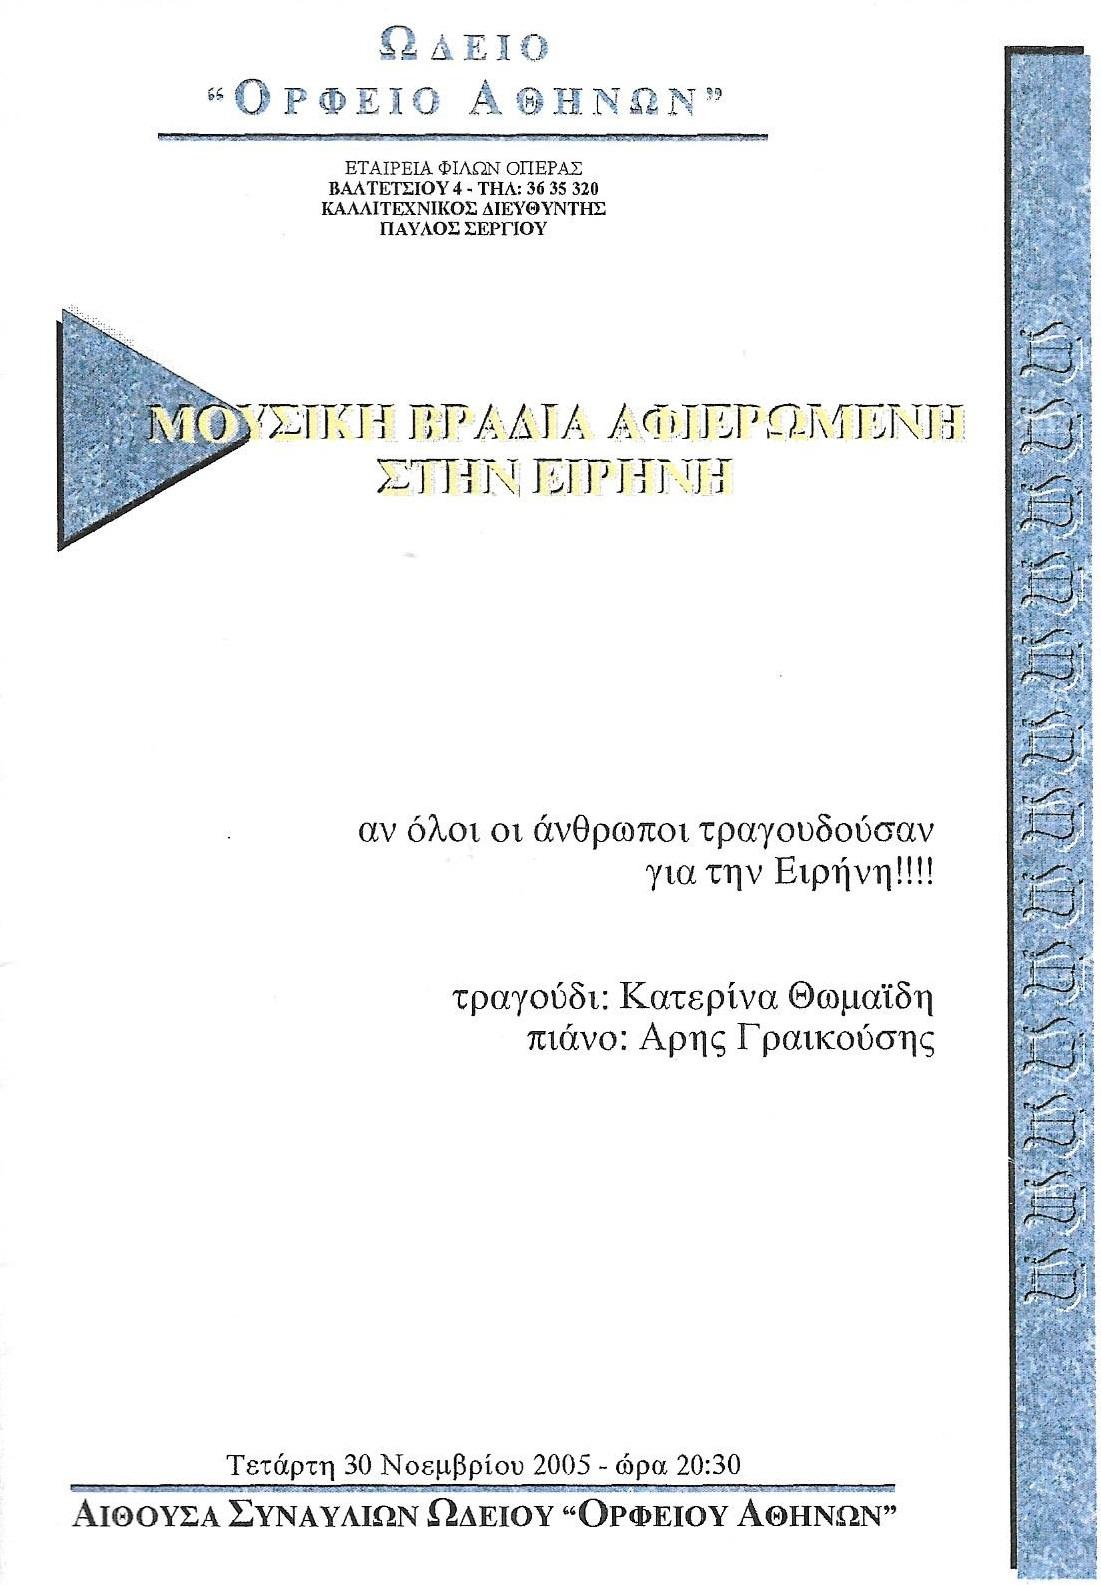 2005-11-30